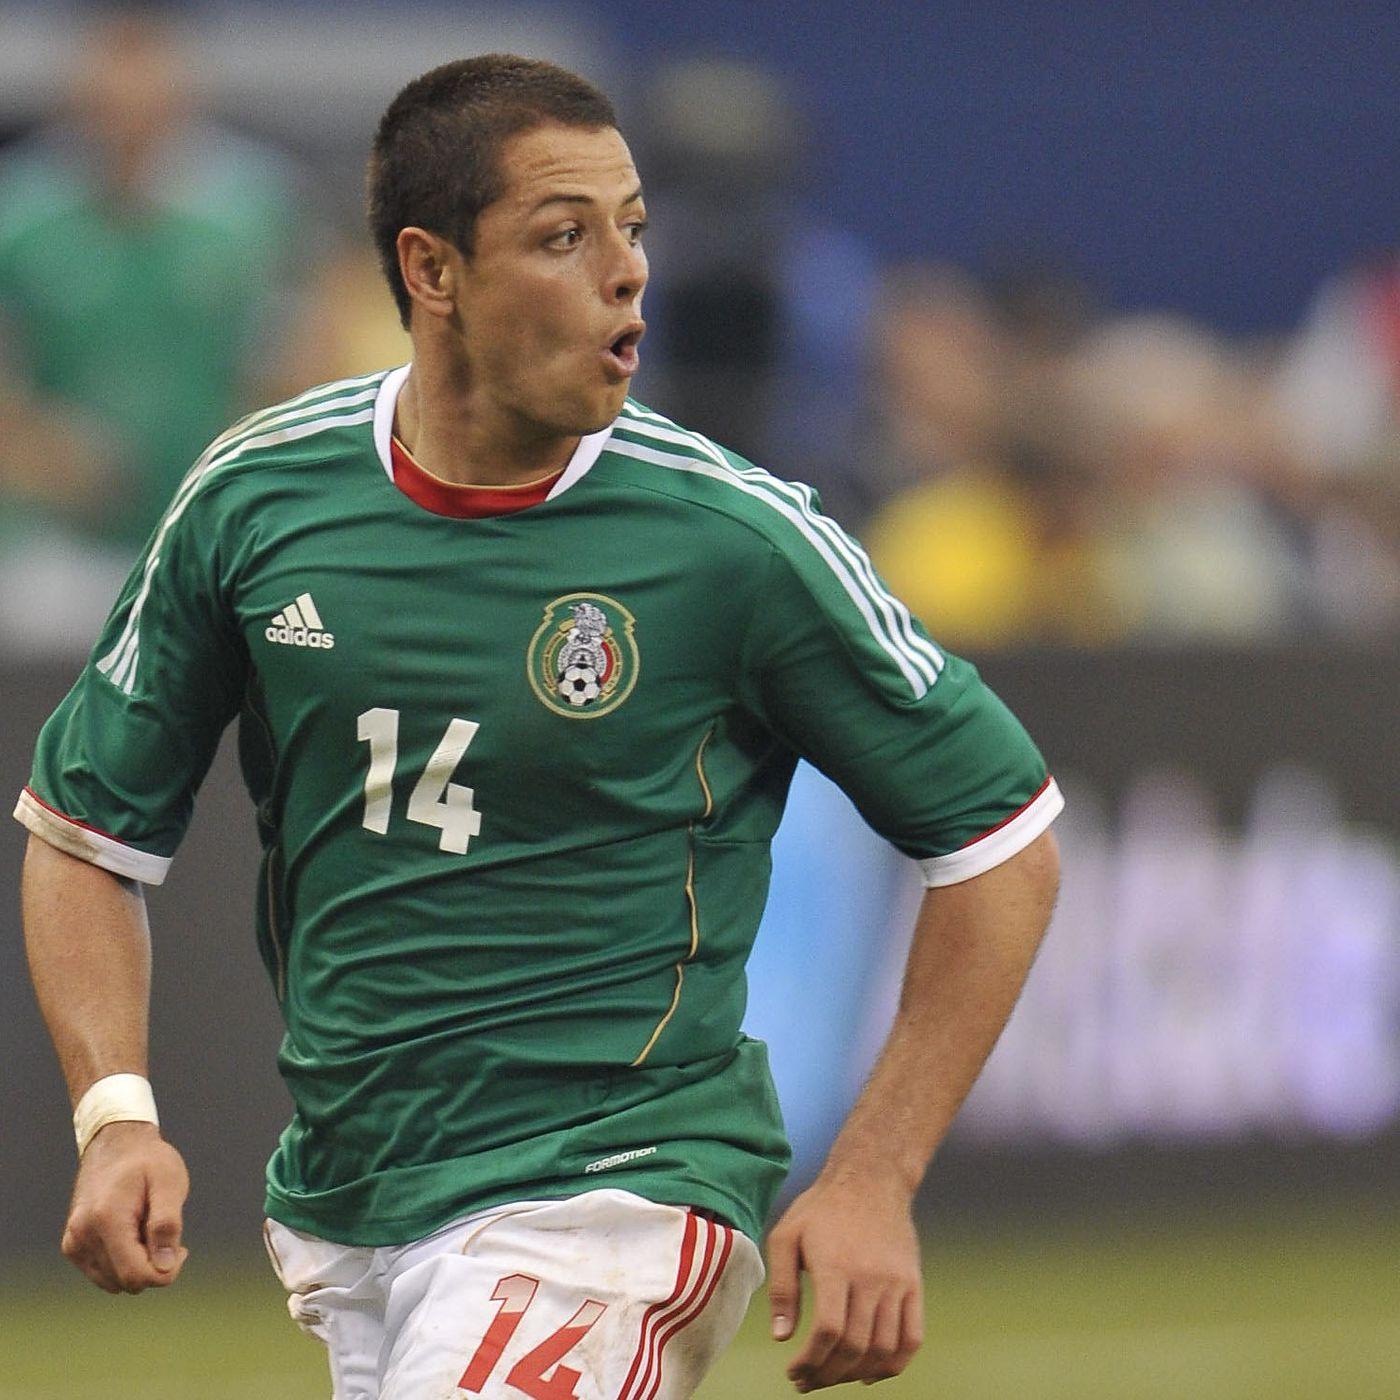 size 40 8b572 4e9cb Transfer Rumor: Real Madrid's Chicharito to Orlando City ...